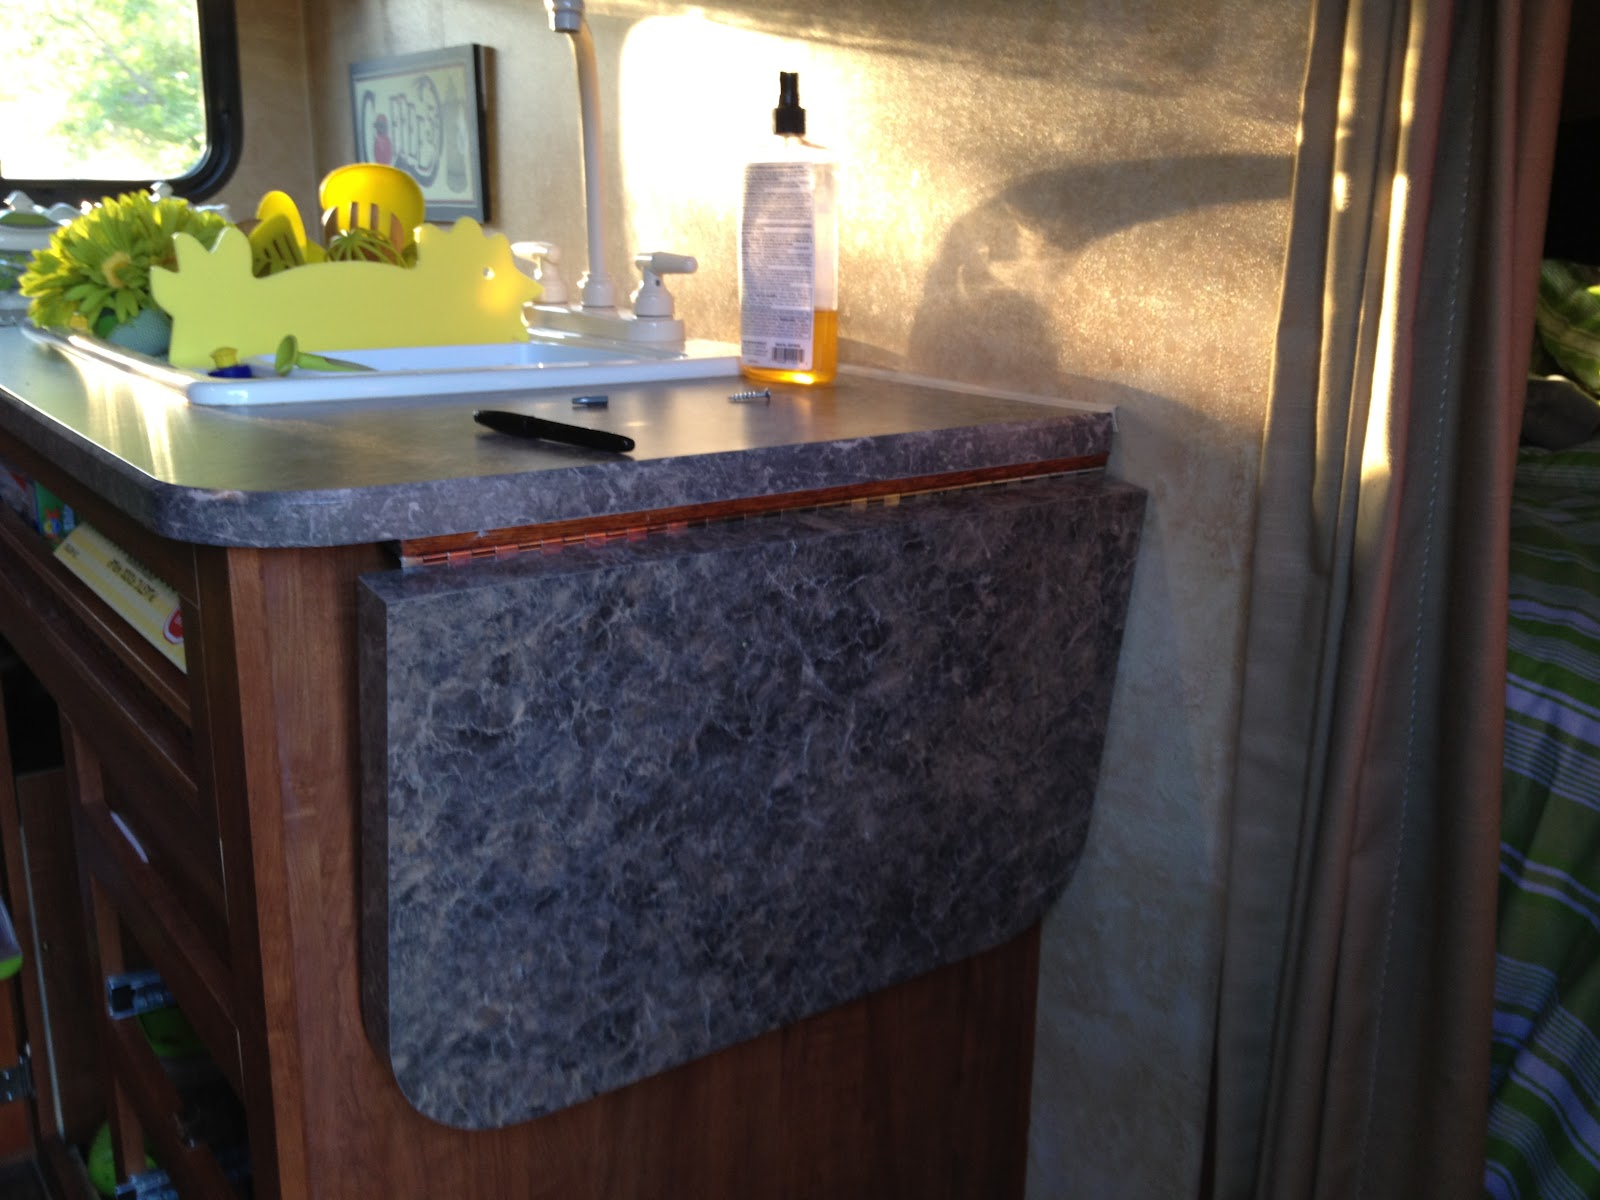 Hinged Counter Tops : My cool camping caravan adventures lady wendolyn jill